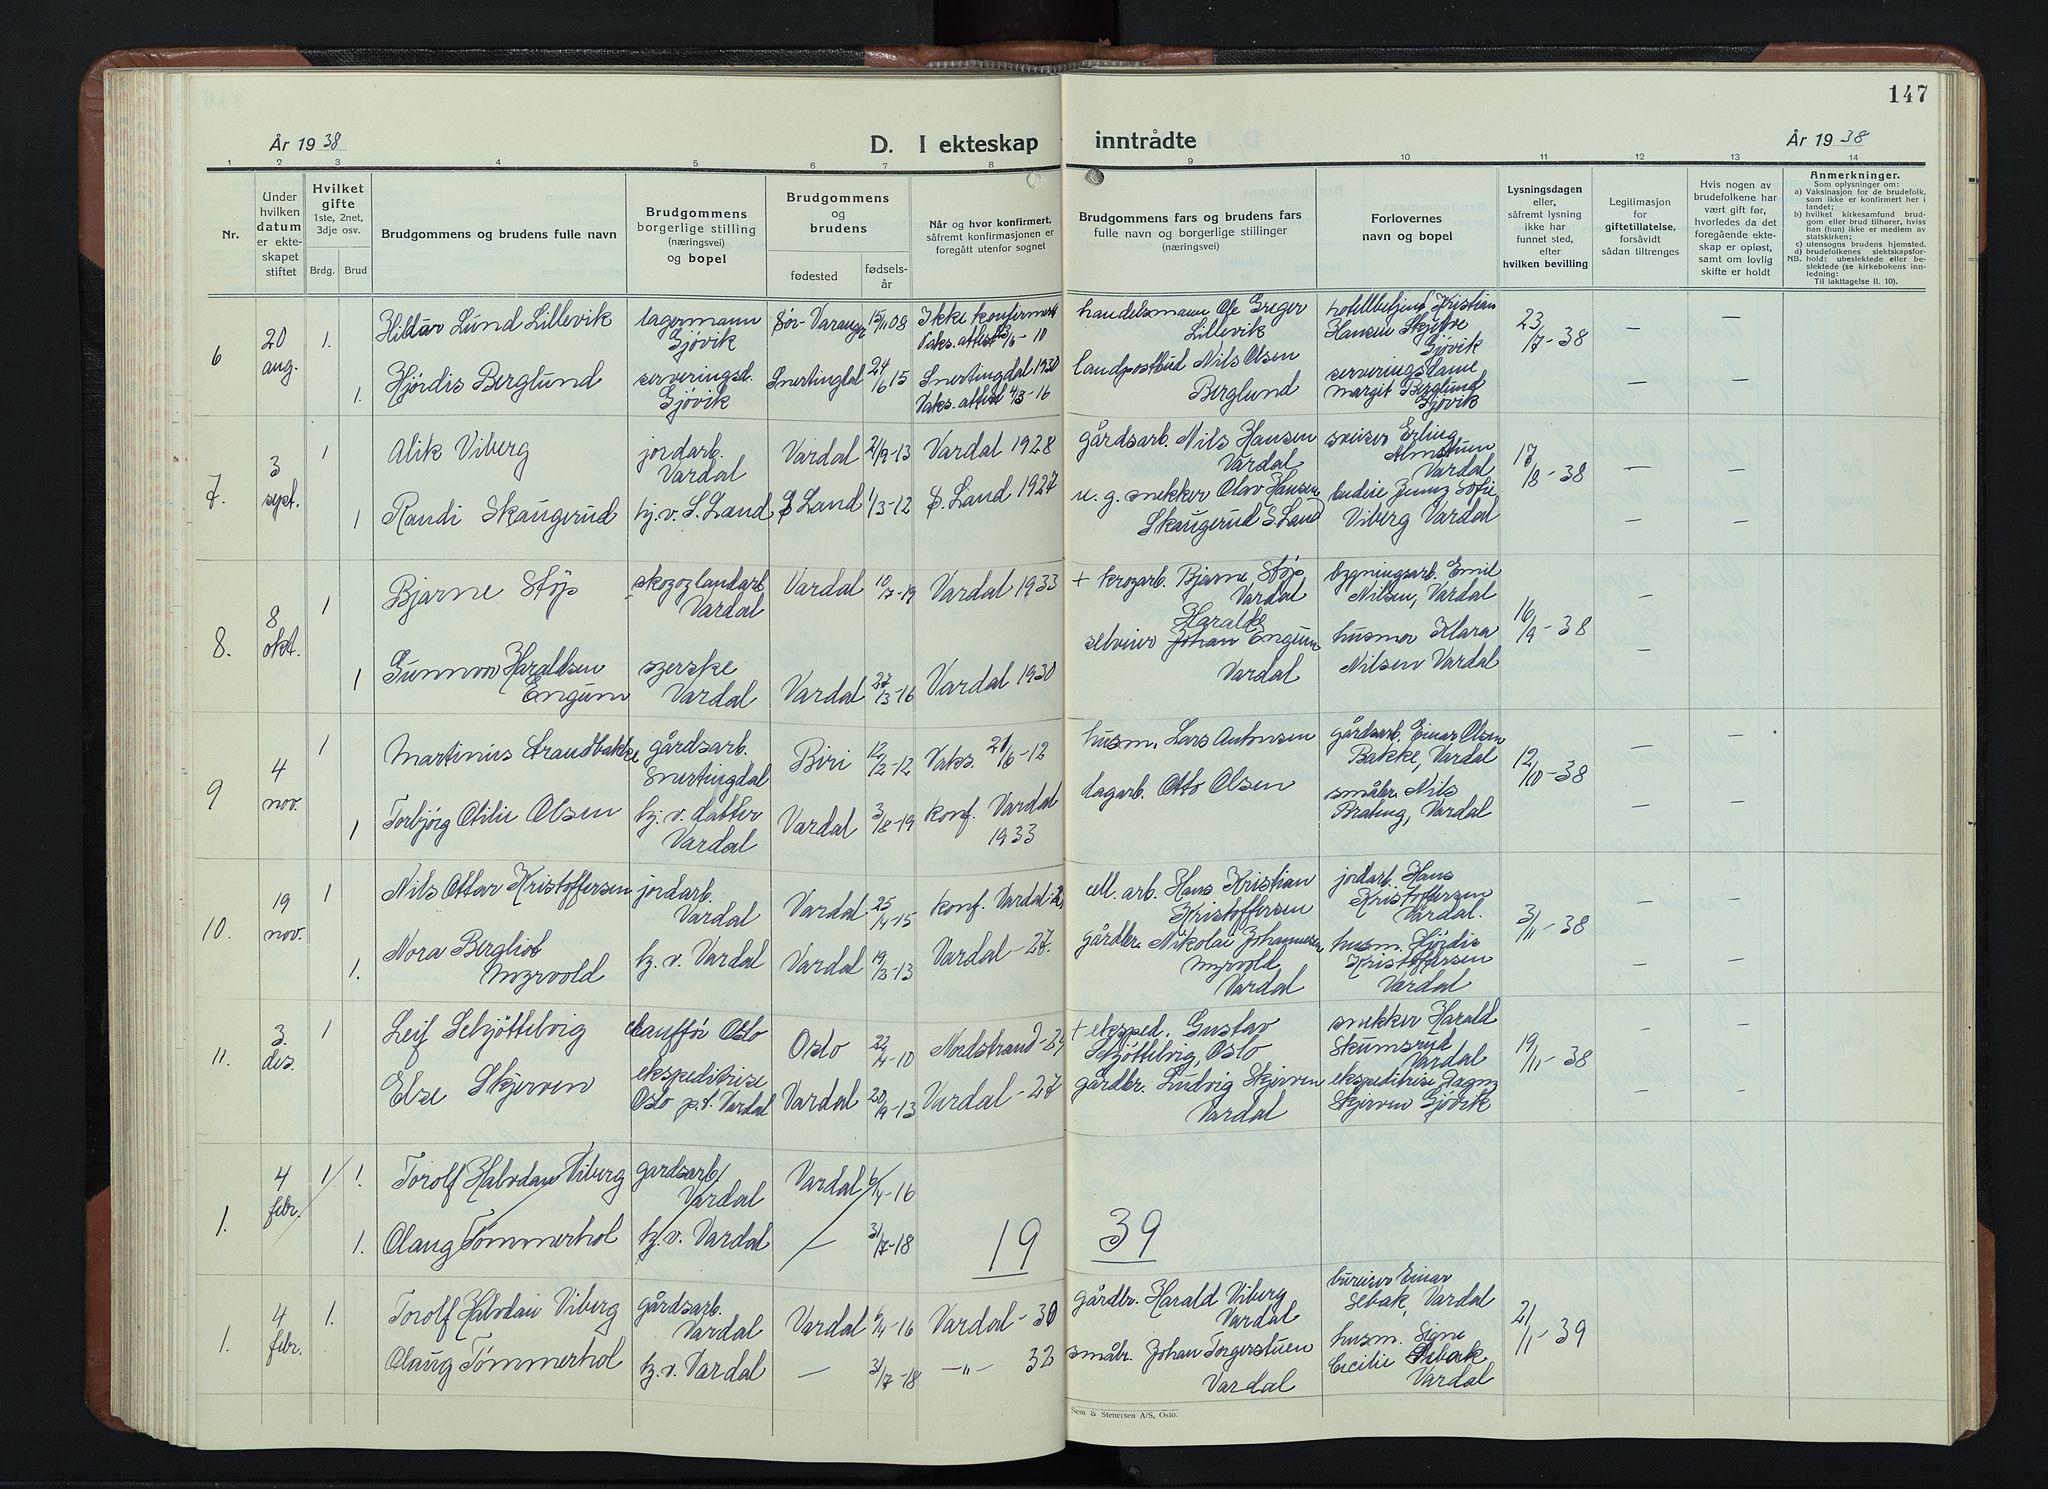 SAH, Vardal prestekontor, H/Ha/Hab/L0018: Klokkerbok nr. 18, 1931-1951, s. 147